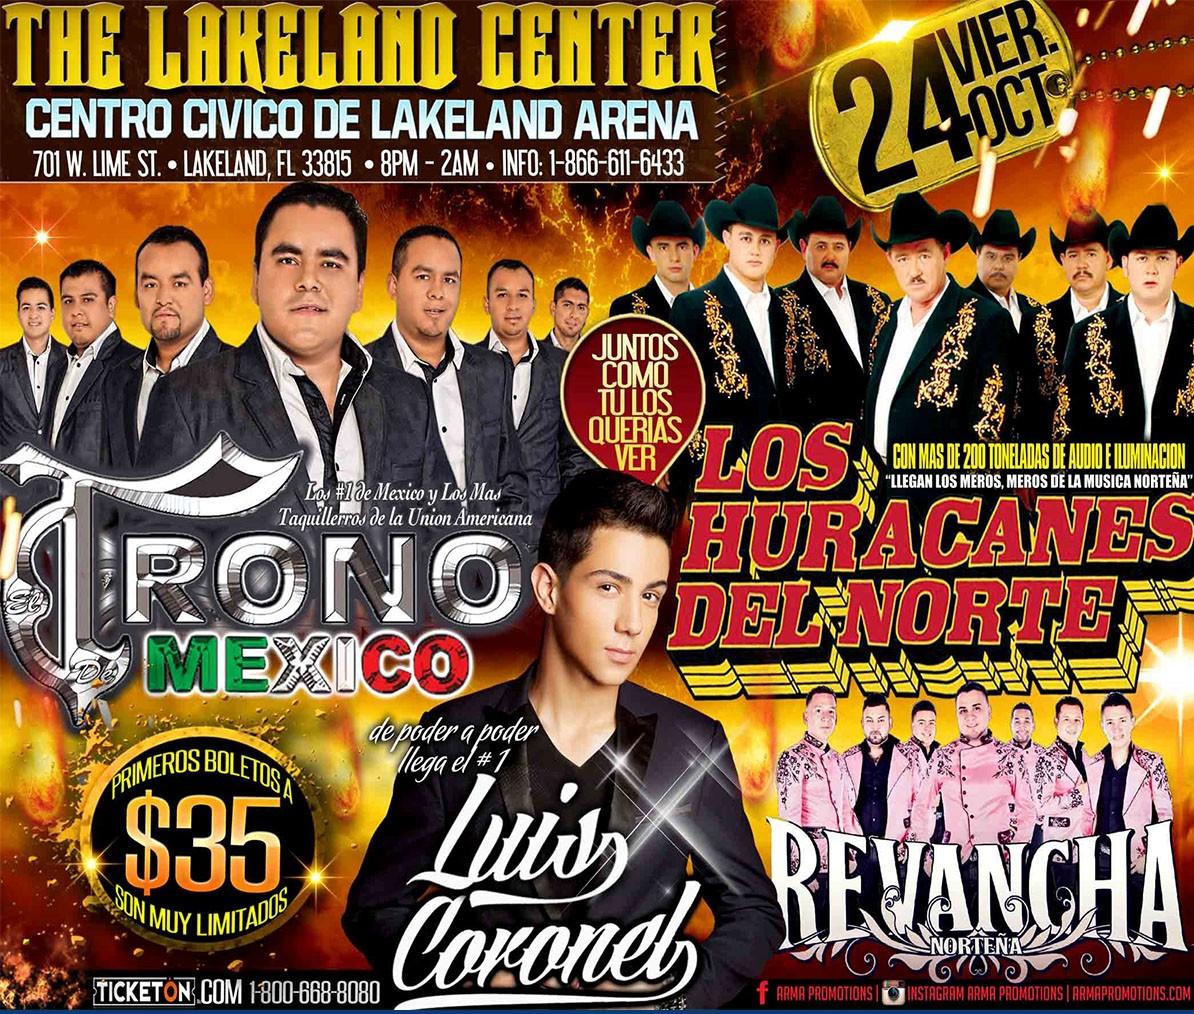 Trono de Mexico @ The Lakeland Center | Lakeland | Florida | United States